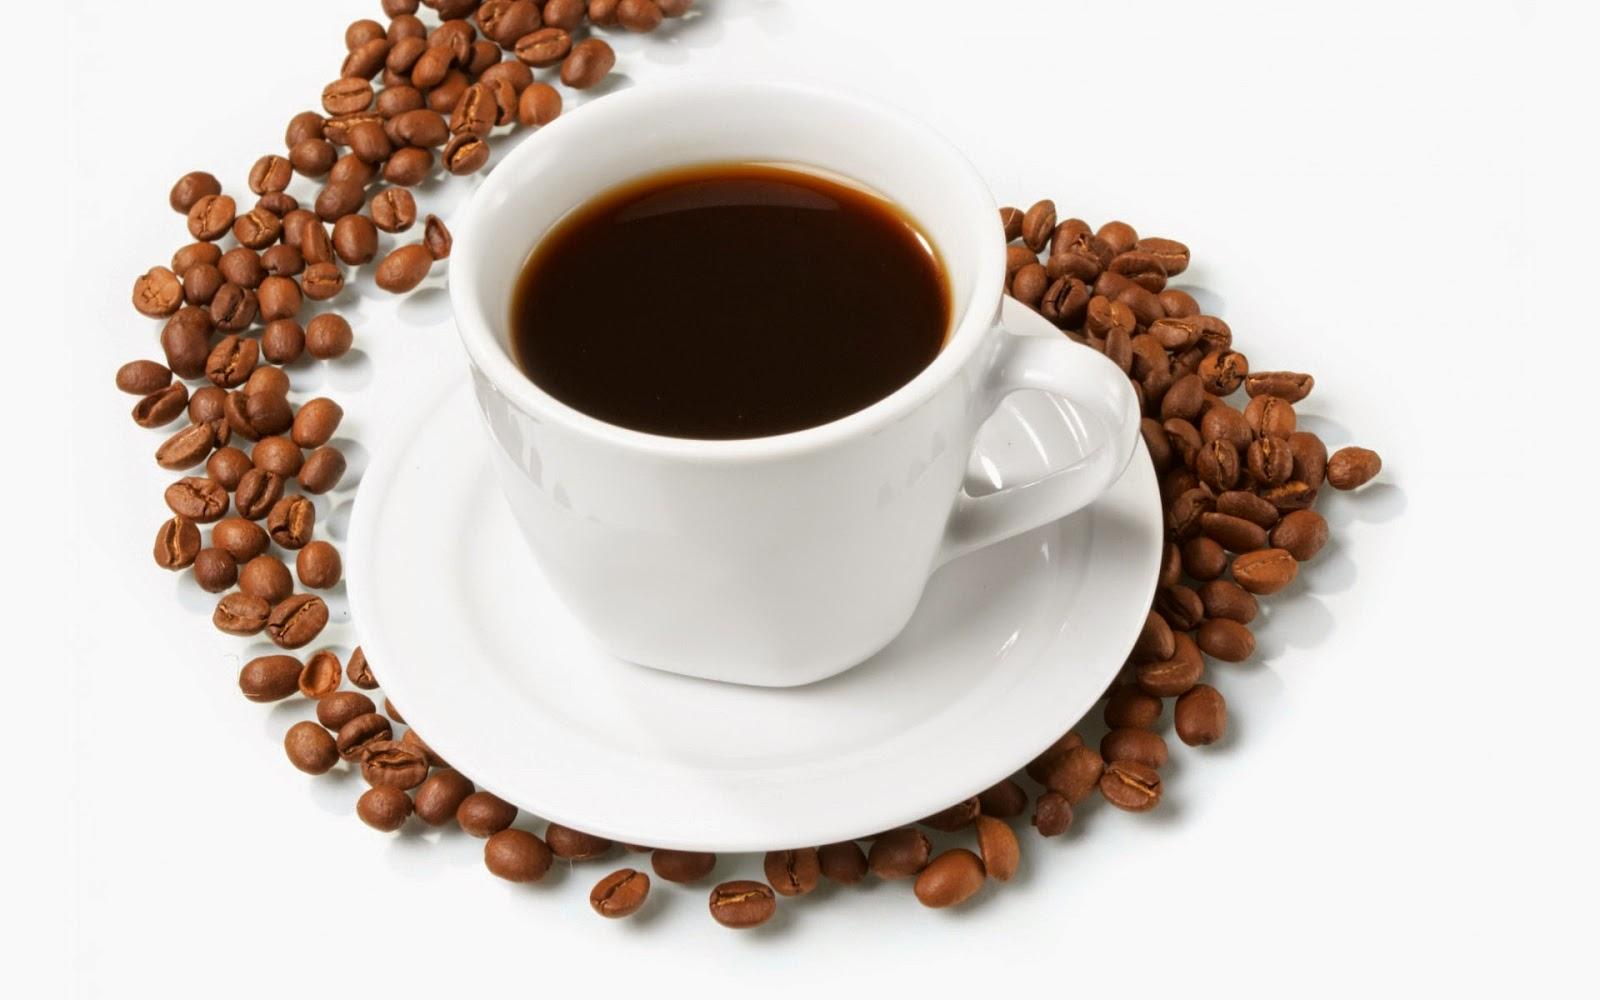 desktop-wallpapers-of-coffee